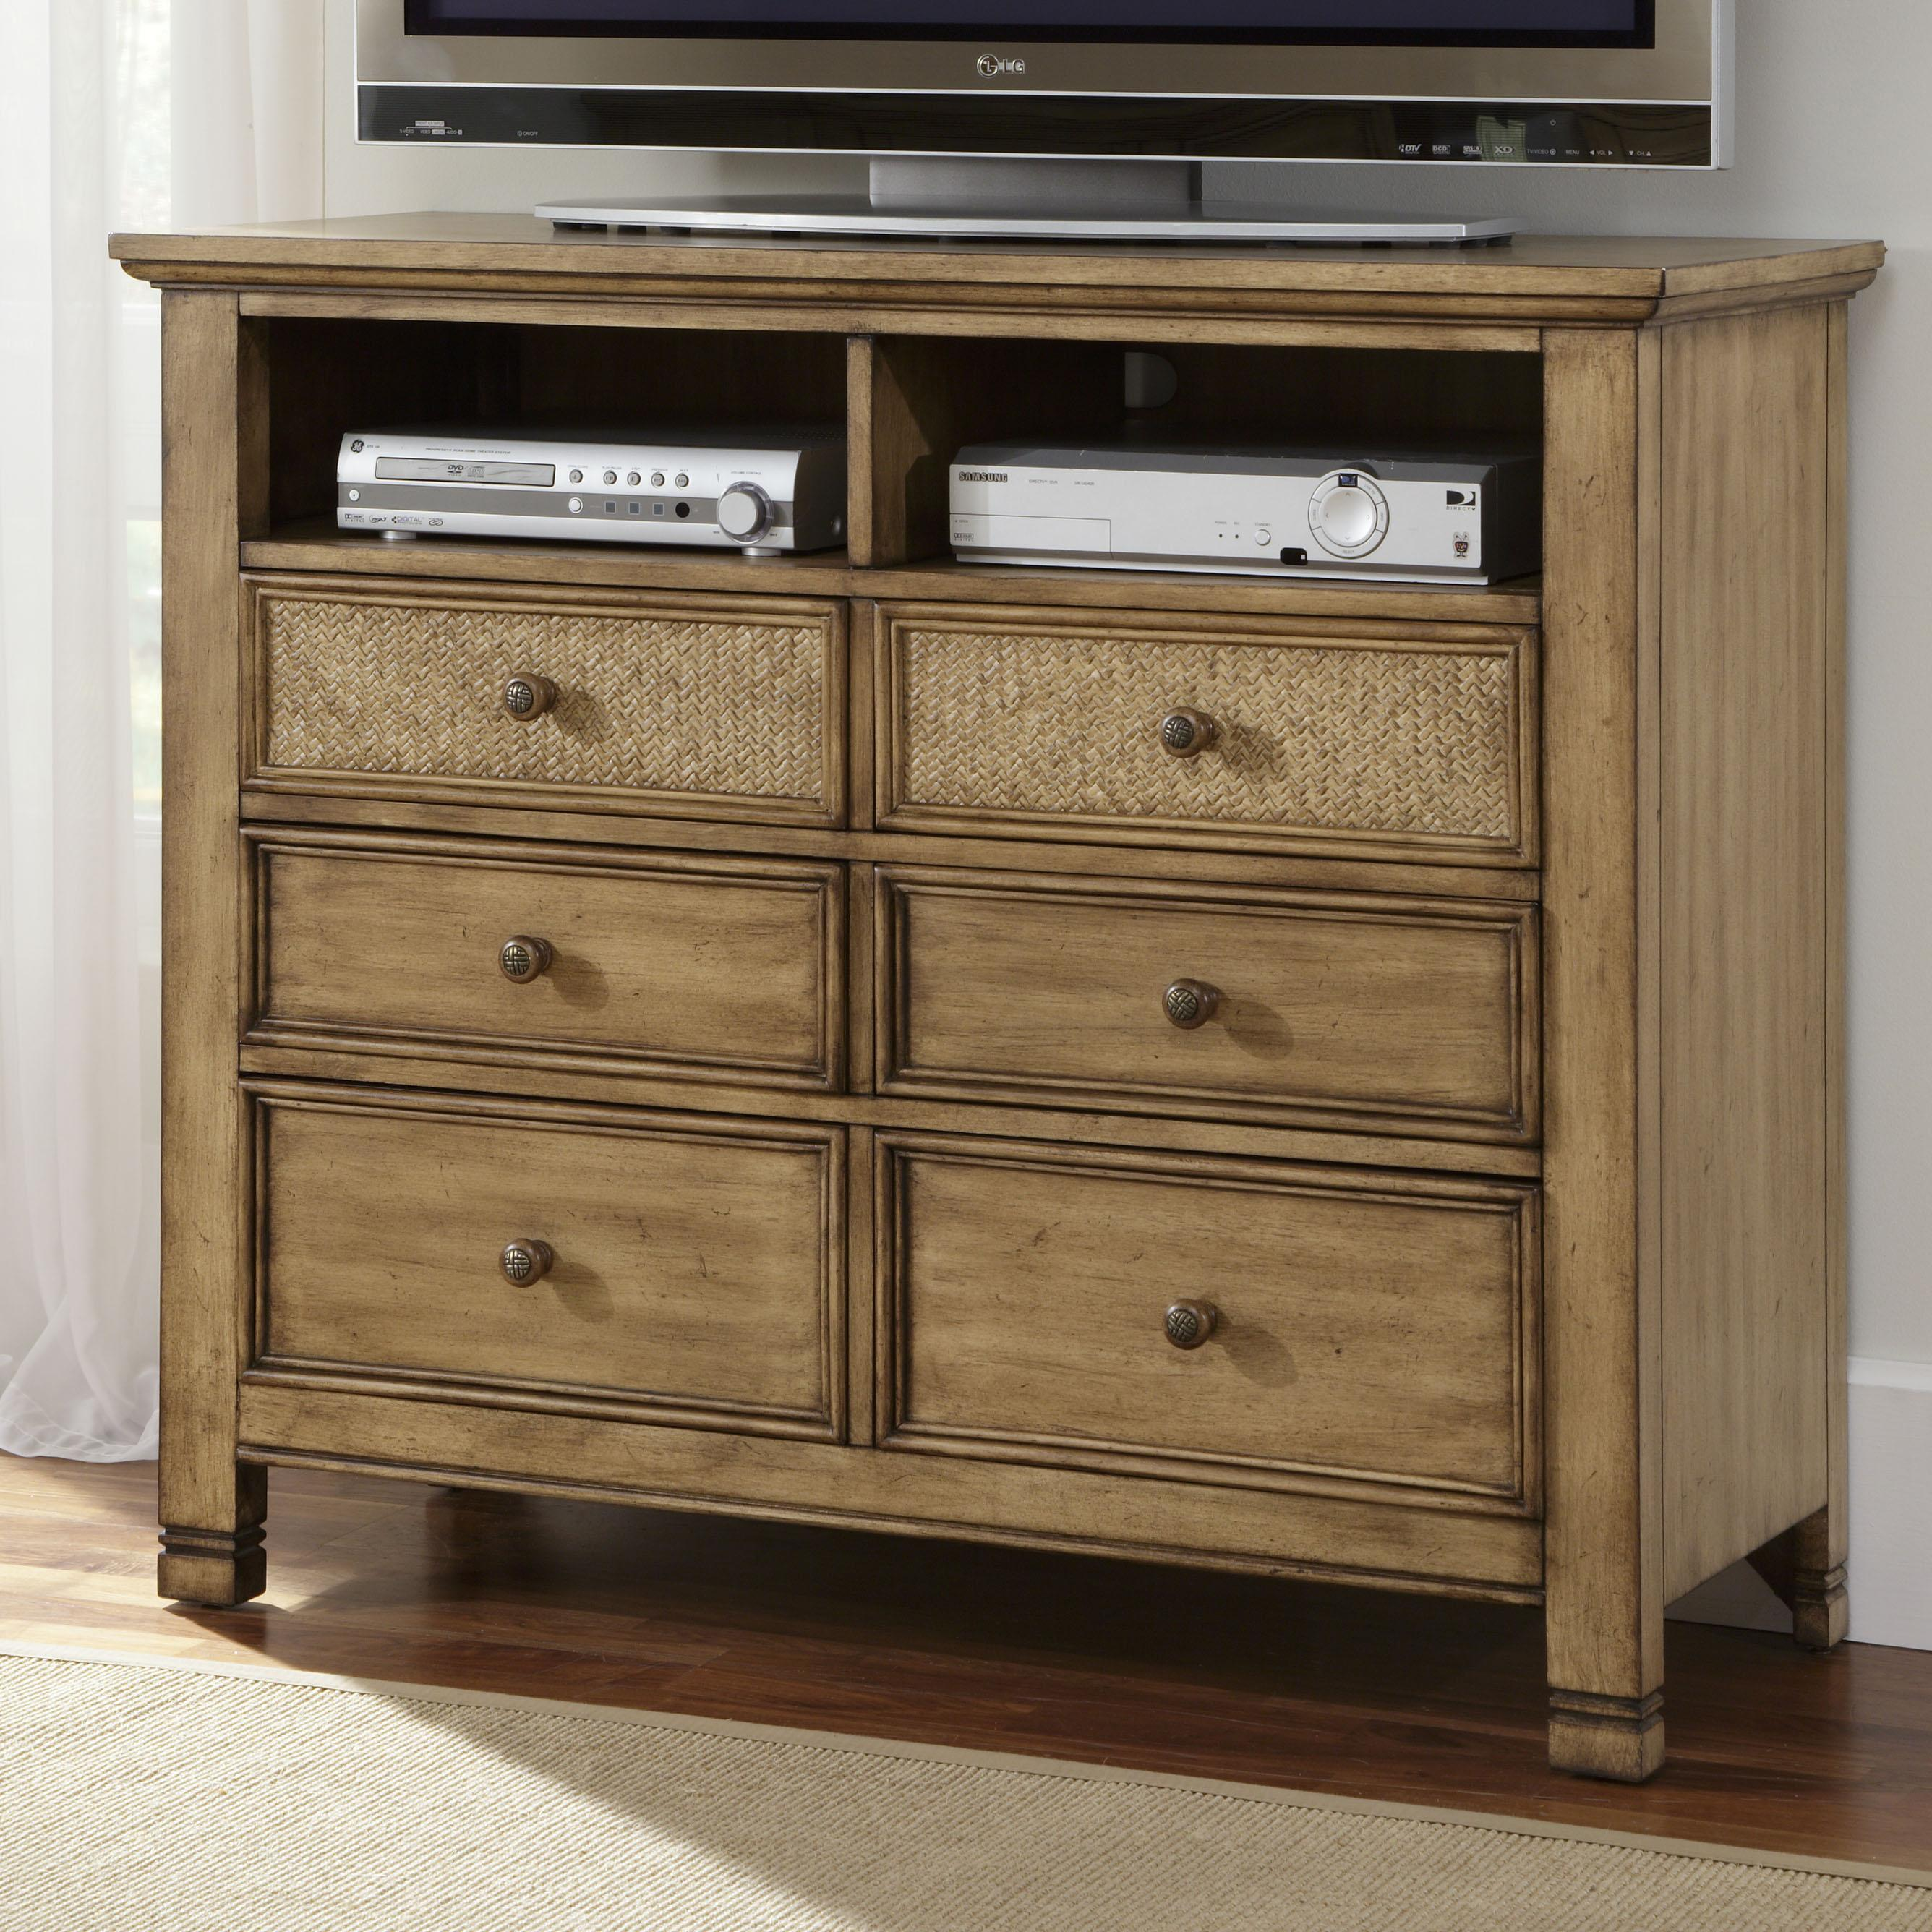 Progressive Furniture Kingston Isle Media Chest - Item Number: P196-46